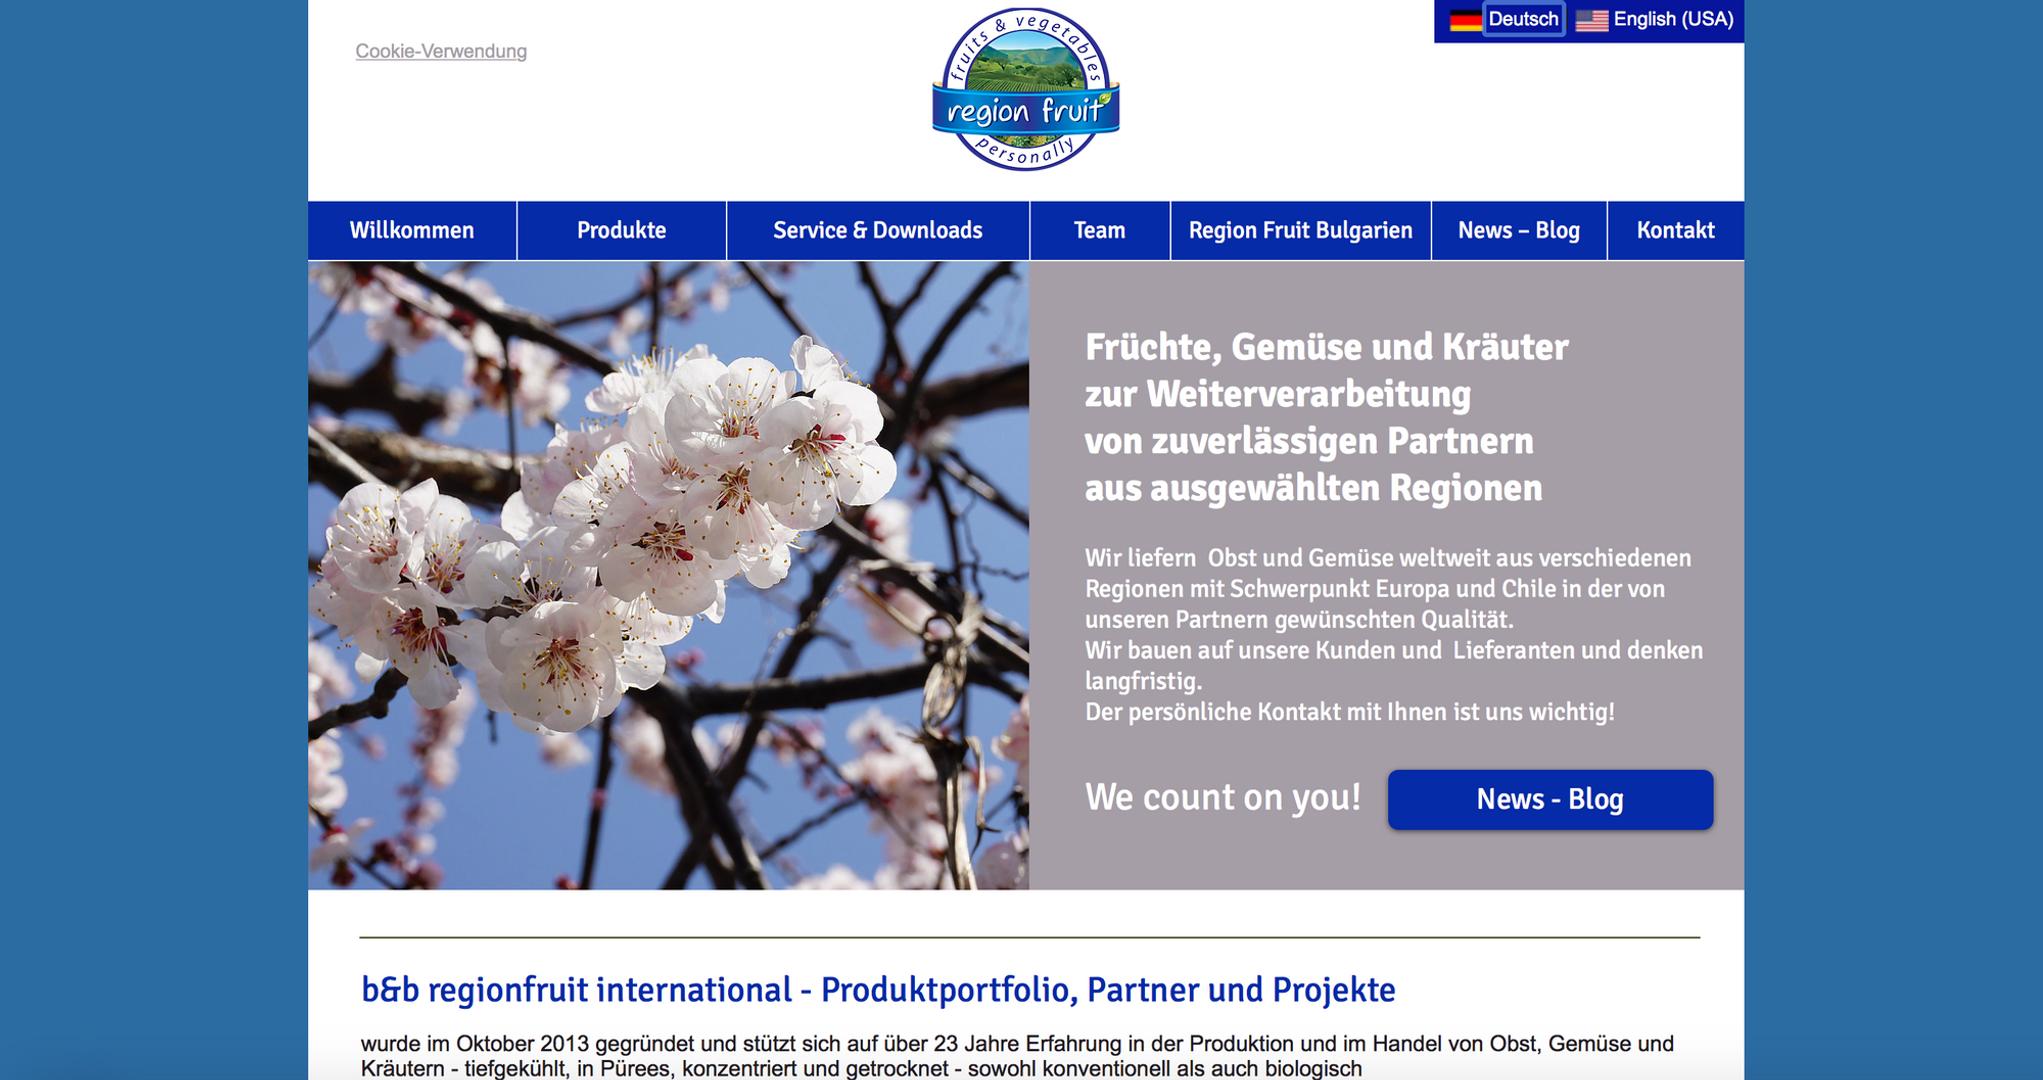 Regionfruit german.png